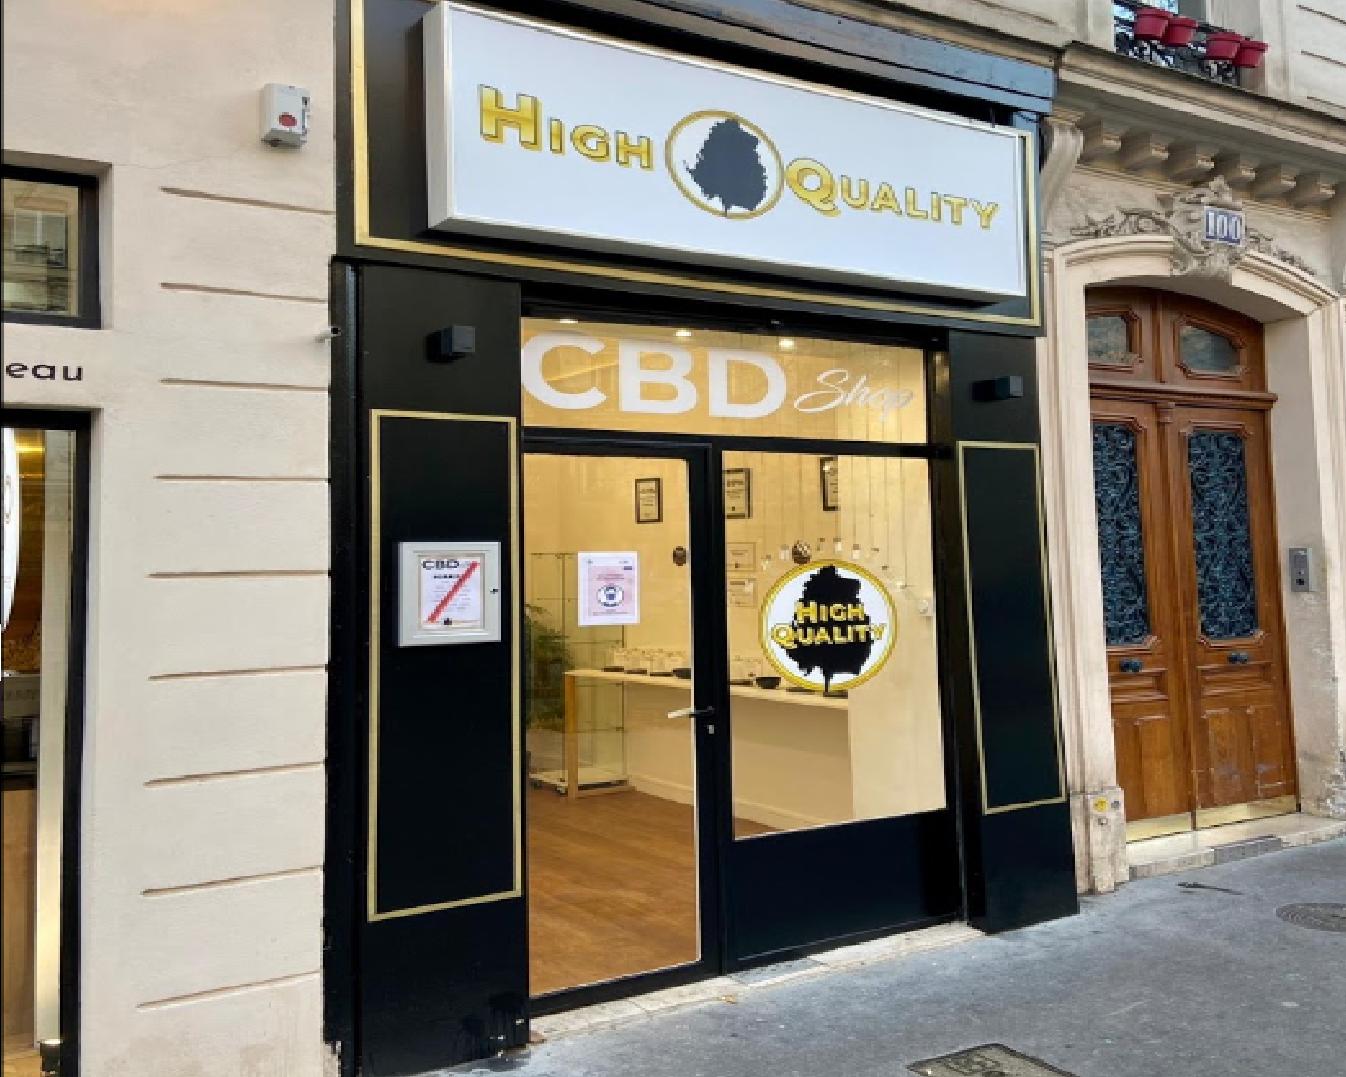 High Quality CBD Shop